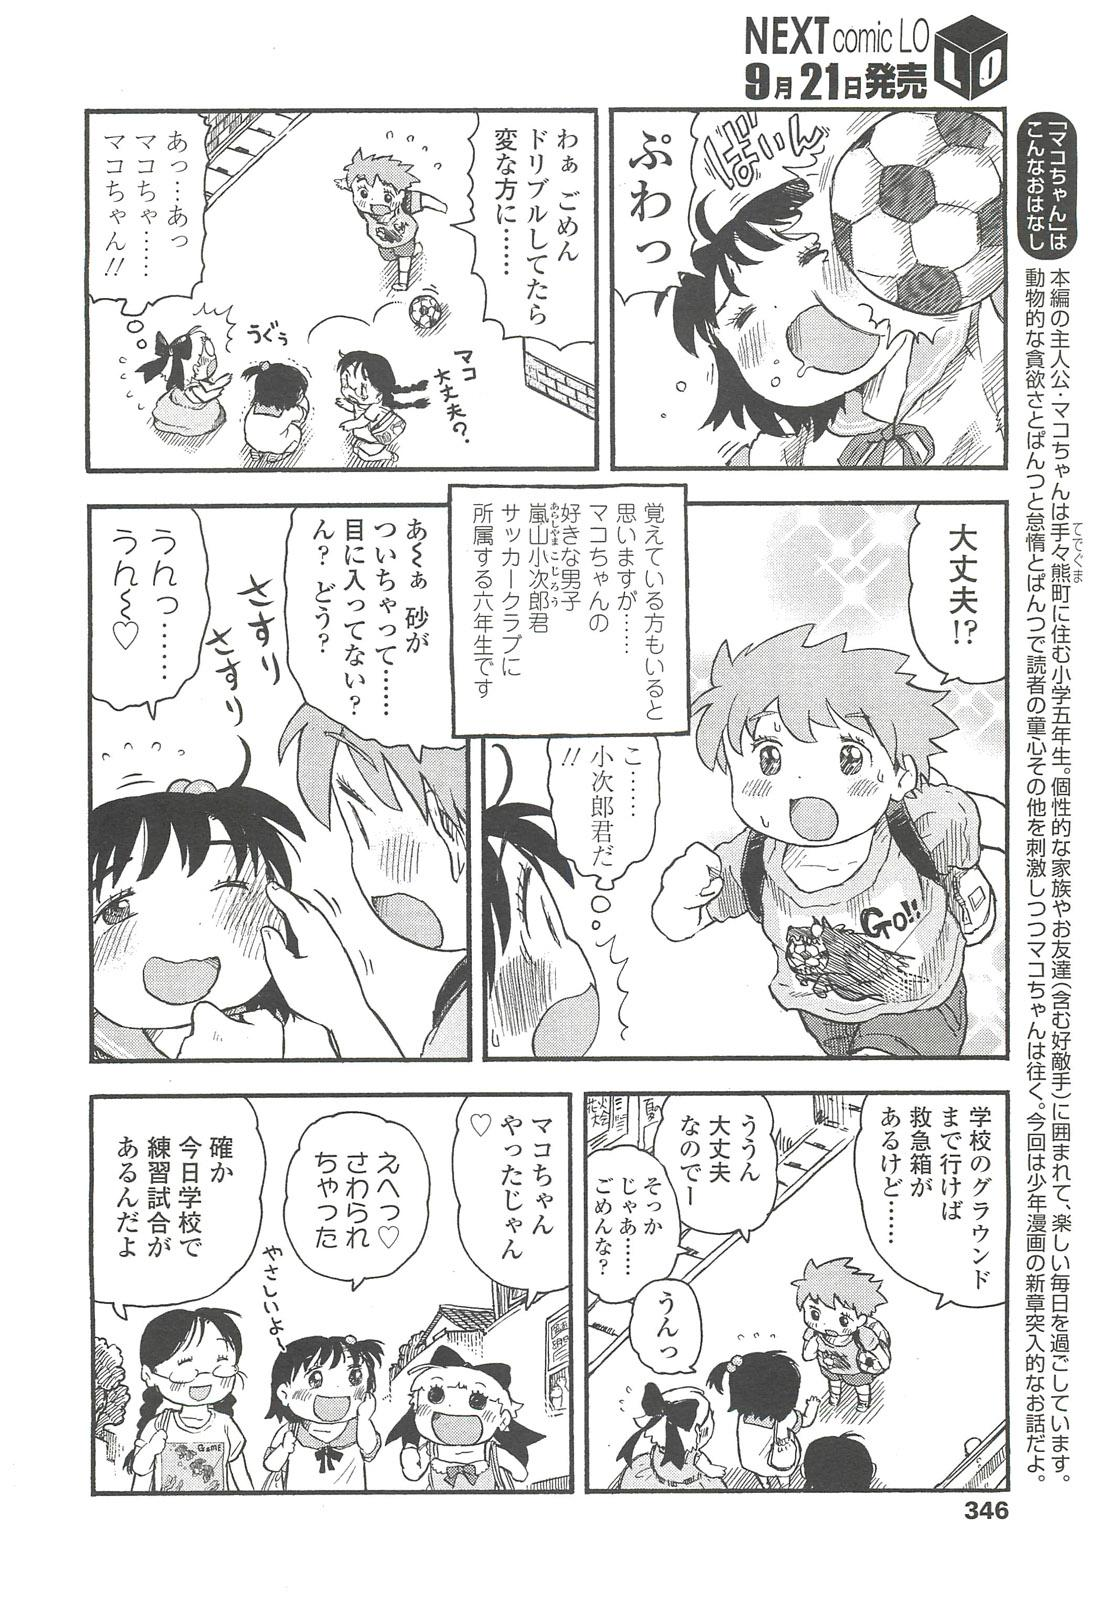 COMIC LO 2010-10 Vol. 79 344